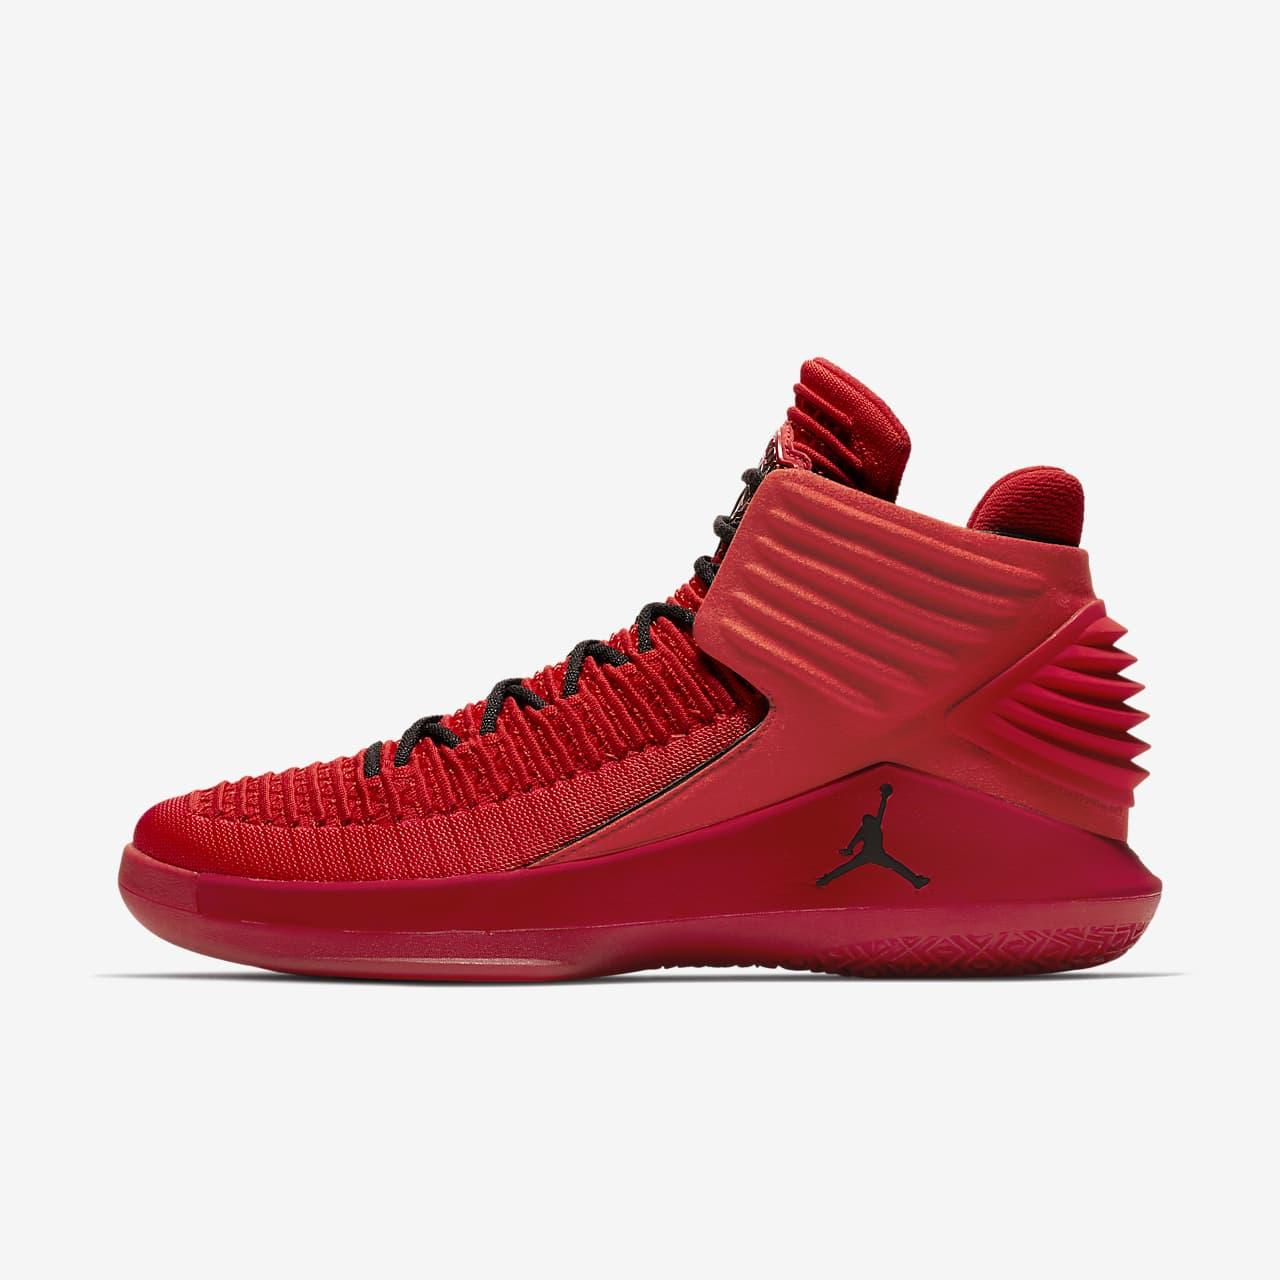 Air Jordan XXXII